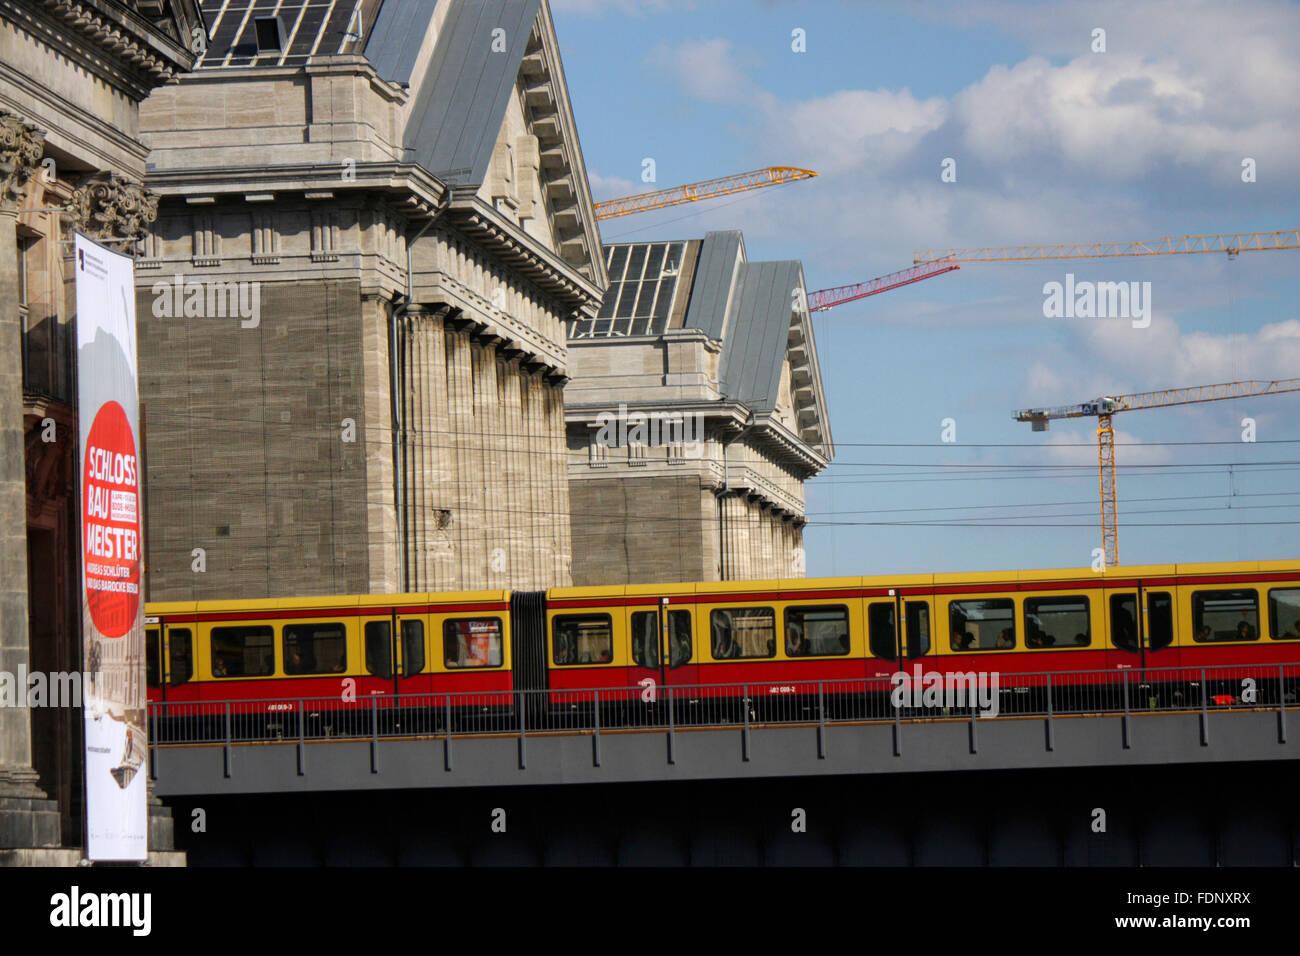 S-Bahn-Zug, Pergamonmuseum, Museumsinsel, Berlin-Mitte. Stockfoto